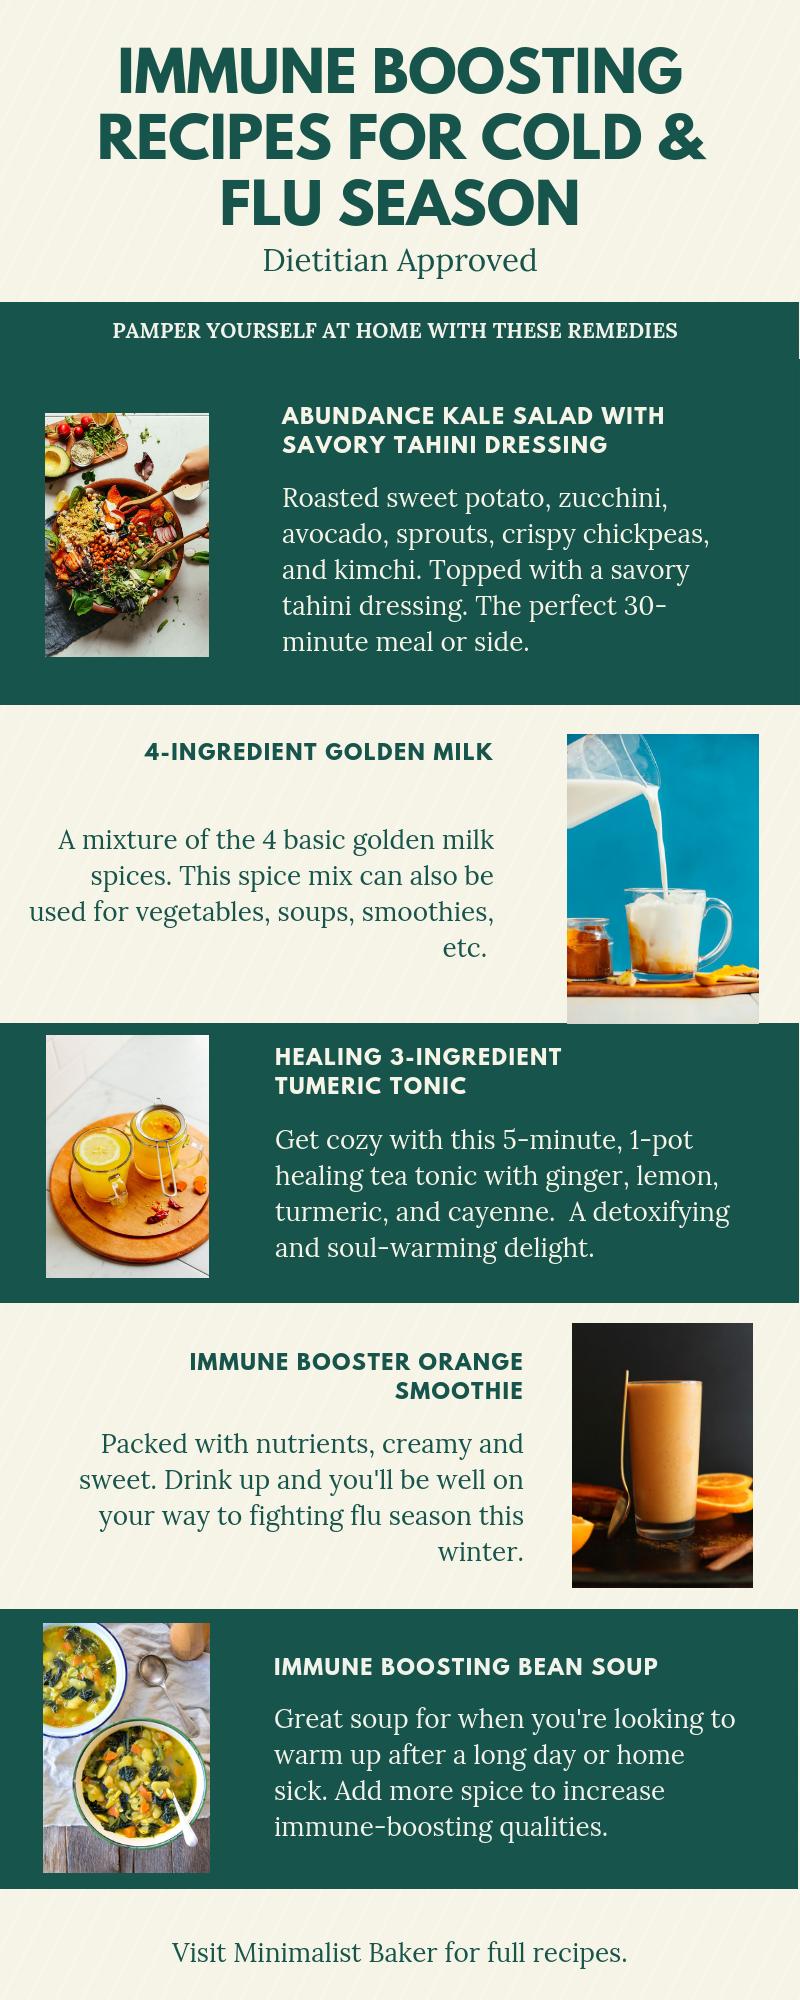 Immune Boosting Recipes for Cold & Flu Season